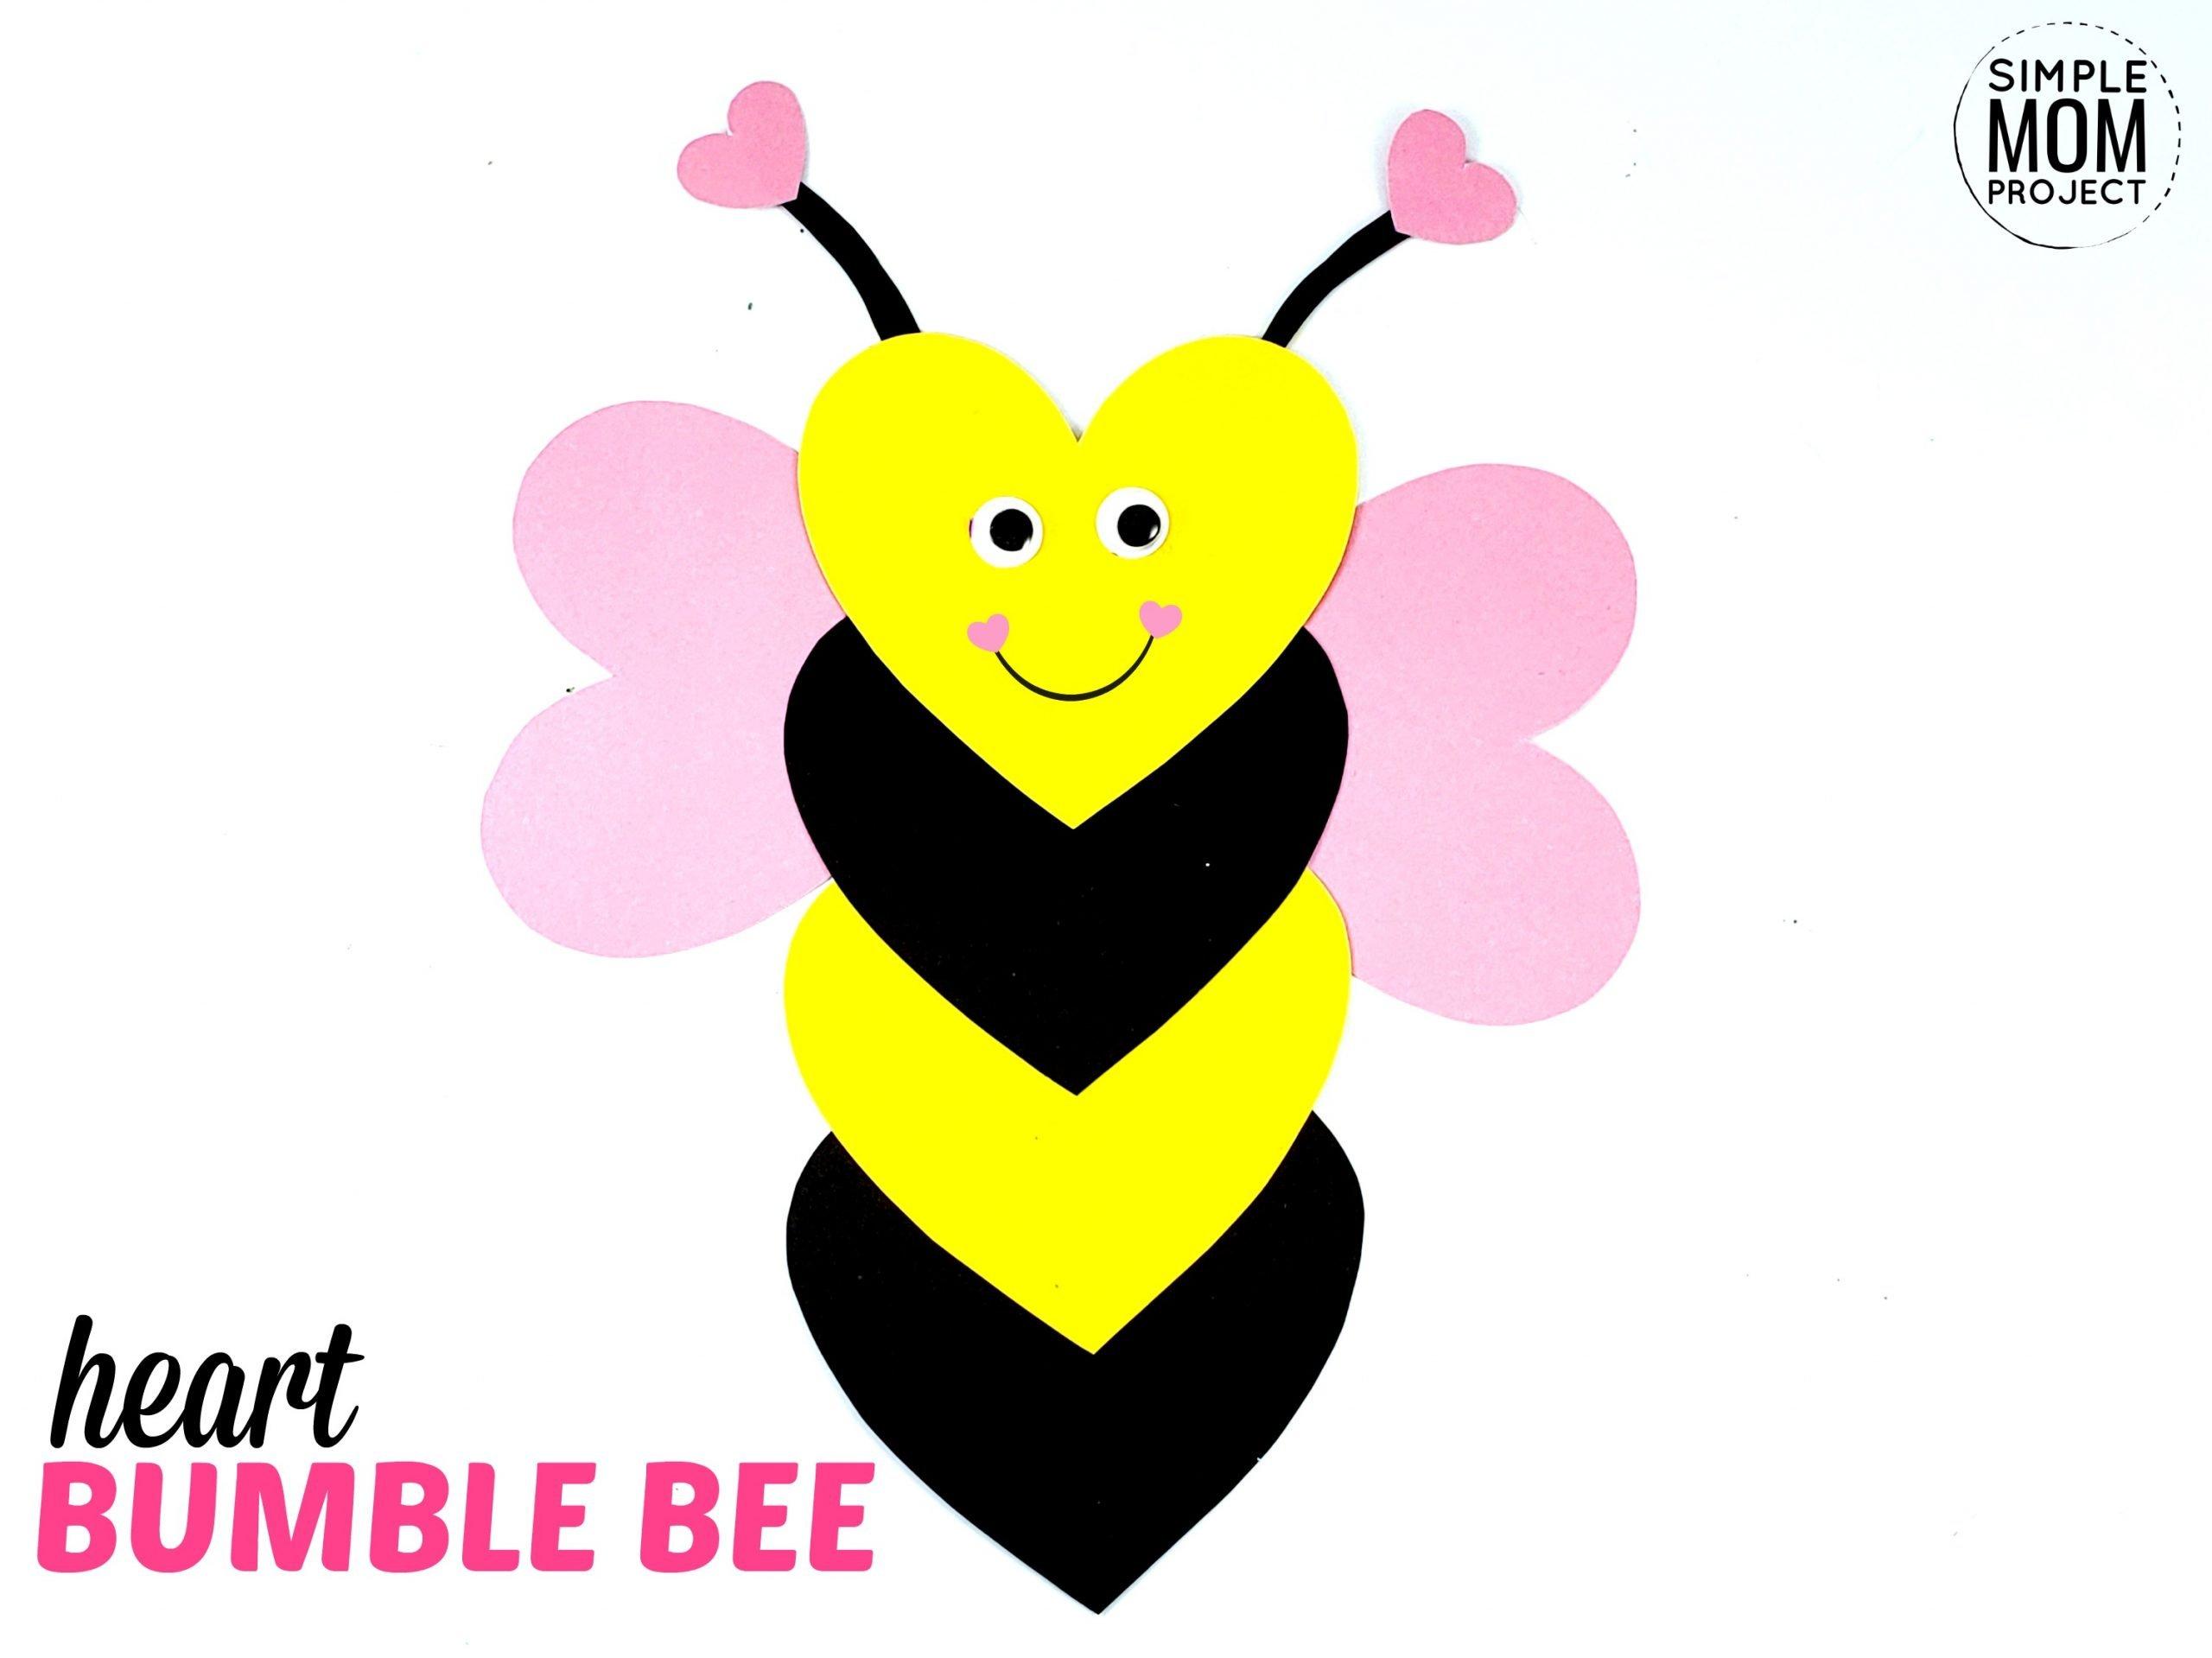 Free Printable Heart Bumblebee Craft for Preschoolers toddlers and kindergartners